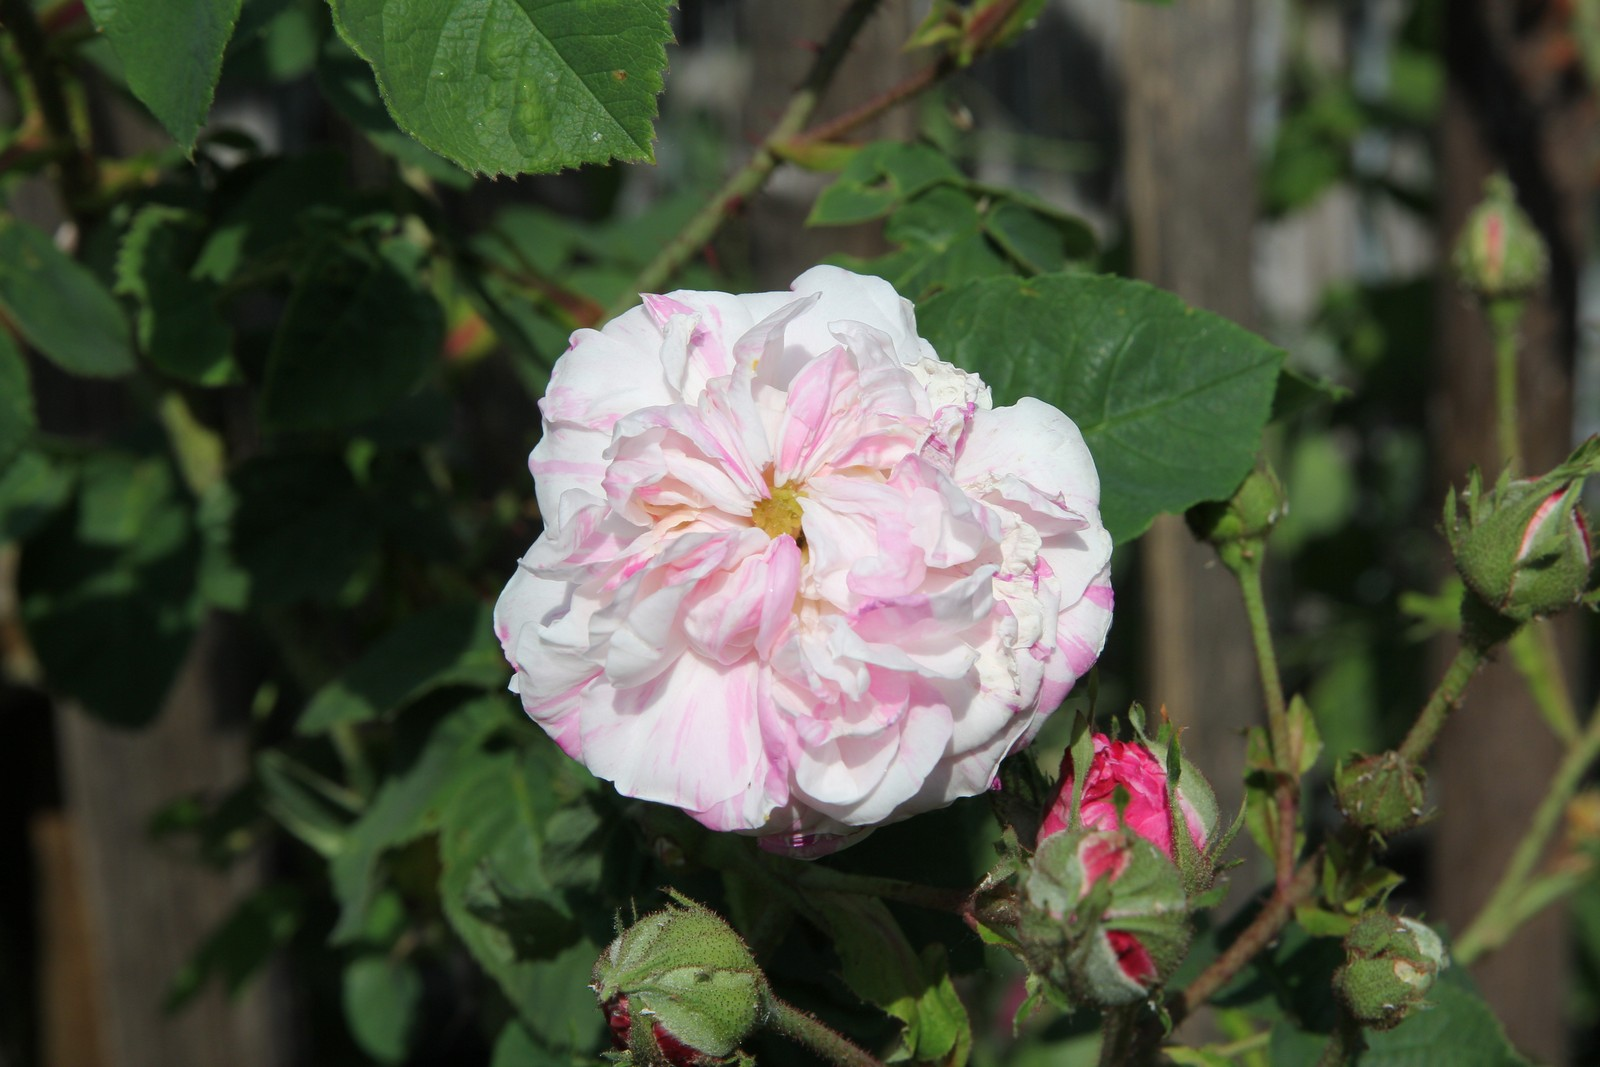 Rosa x centifolia variegata